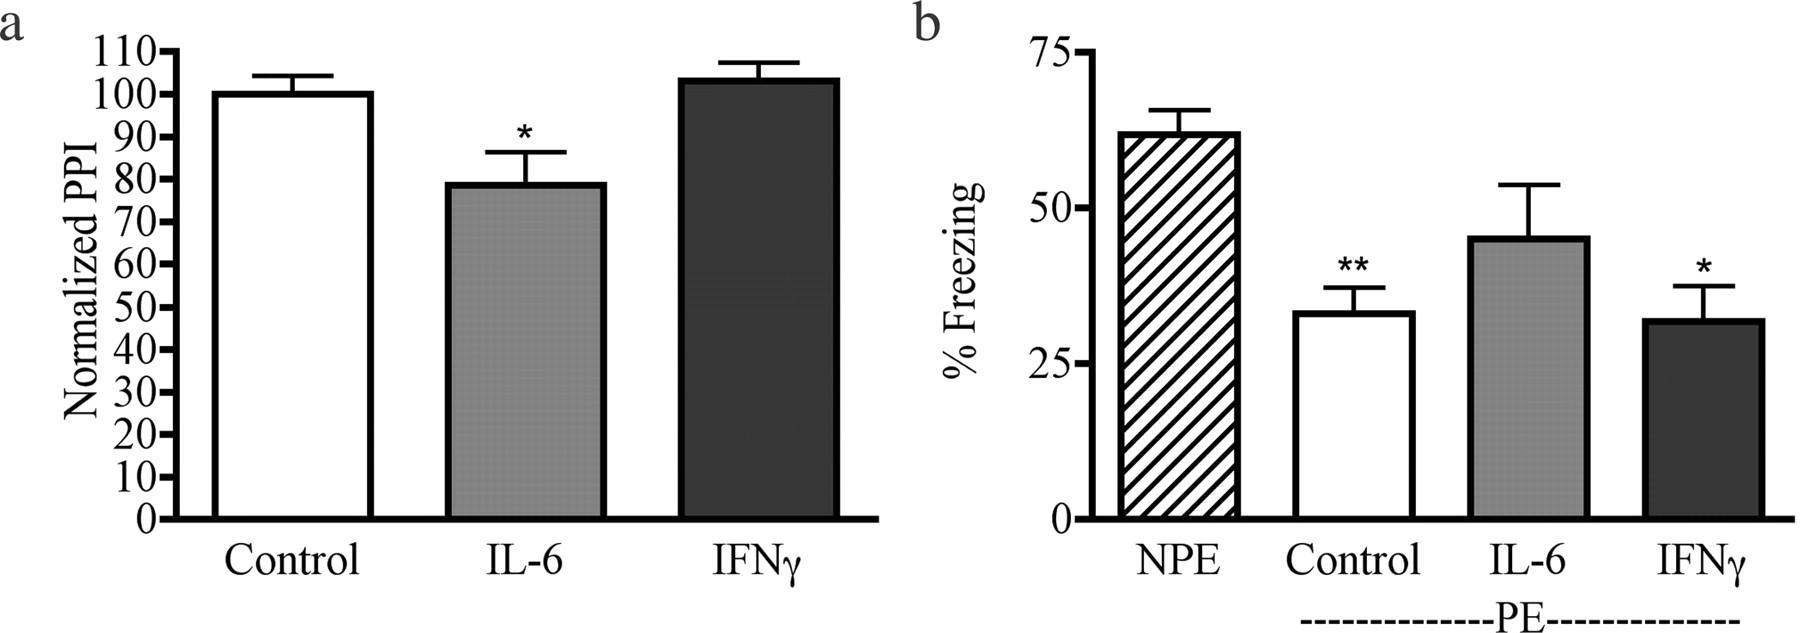 Prenatal Infection May Alter Behavior >> Maternal Immune Activation Alters Fetal Brain Development Through